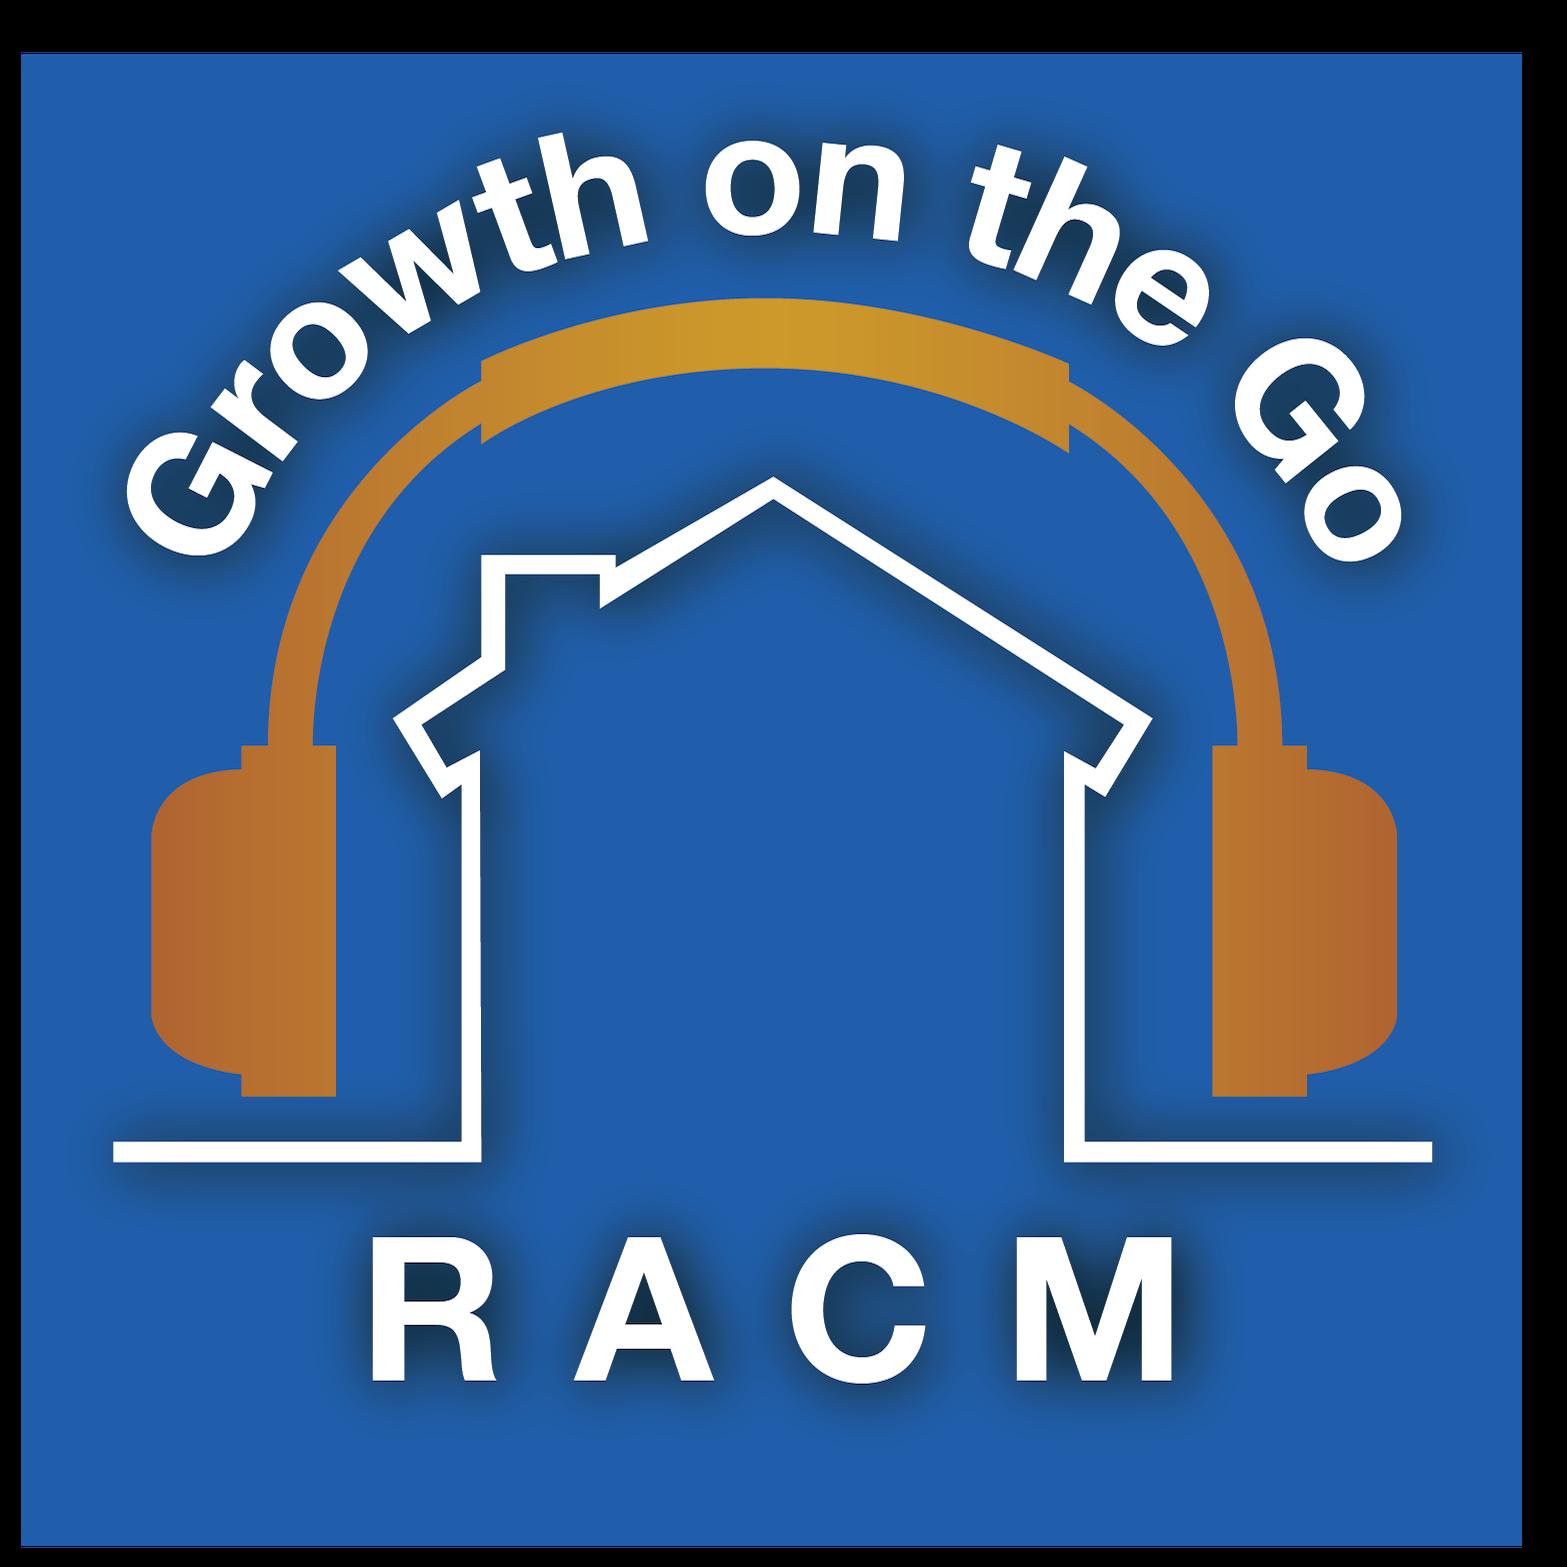 Growth On The Go - Presented by RACM show art